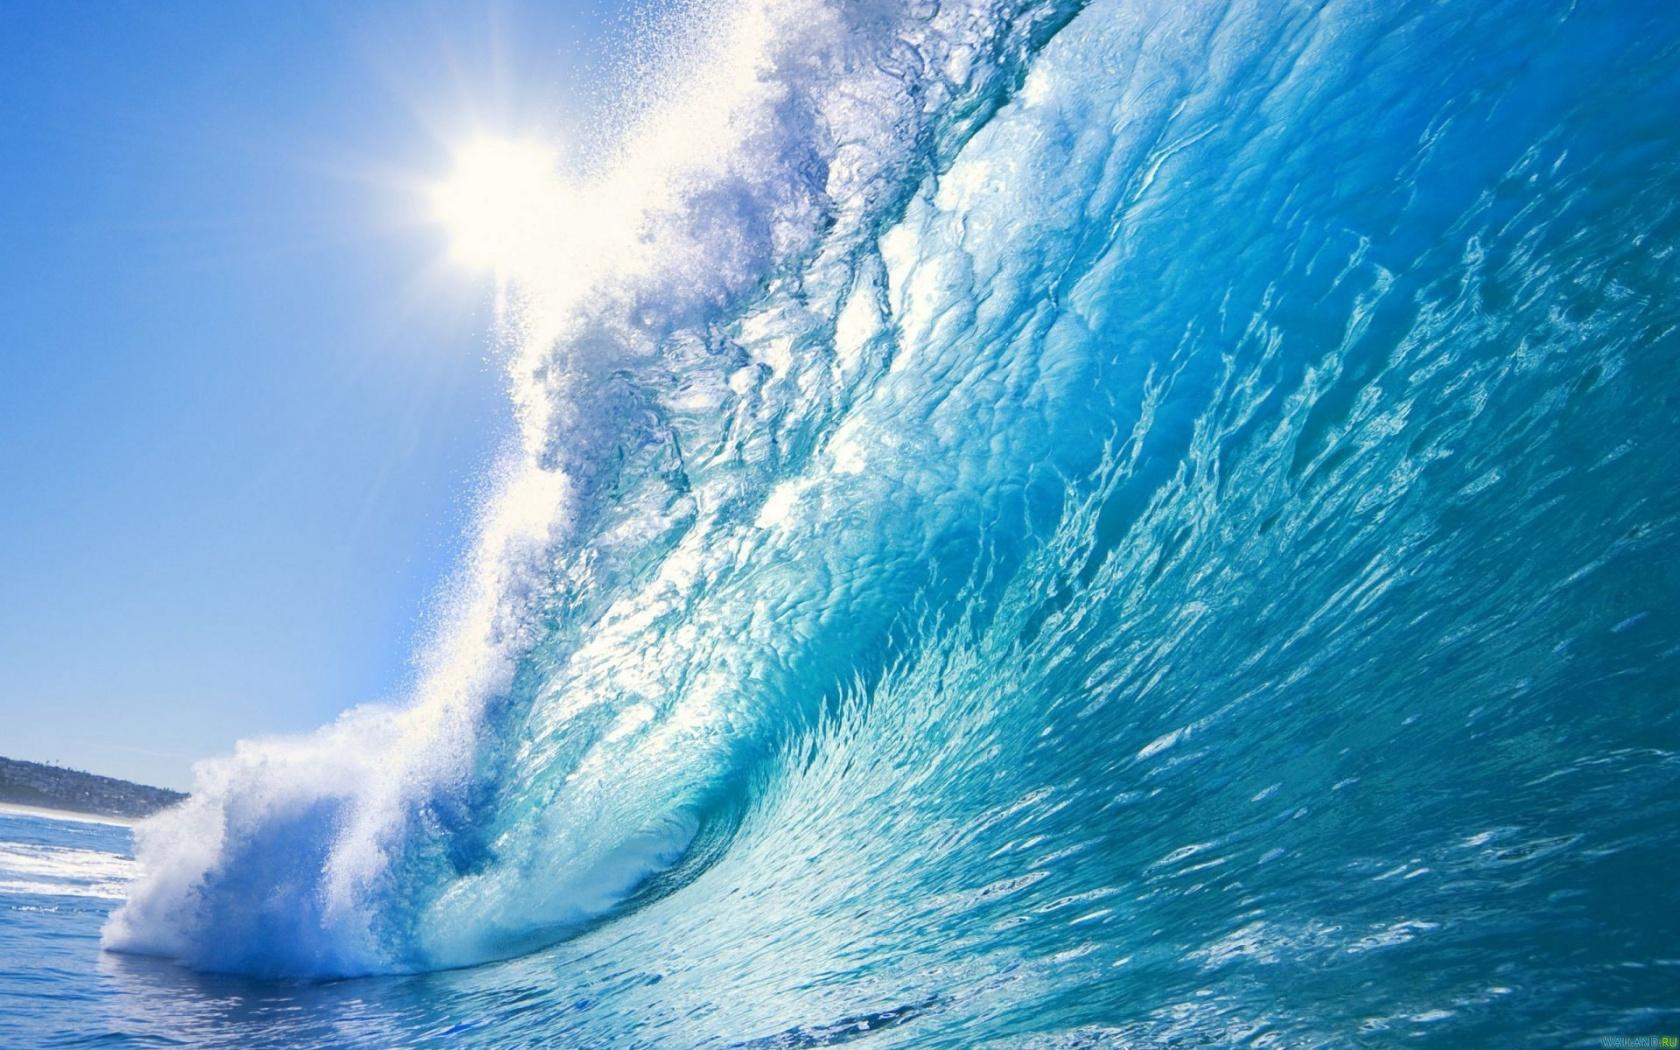 1680x1050 Beautiful ocean wave desktop PC and Mac wallpaper 1680x1050